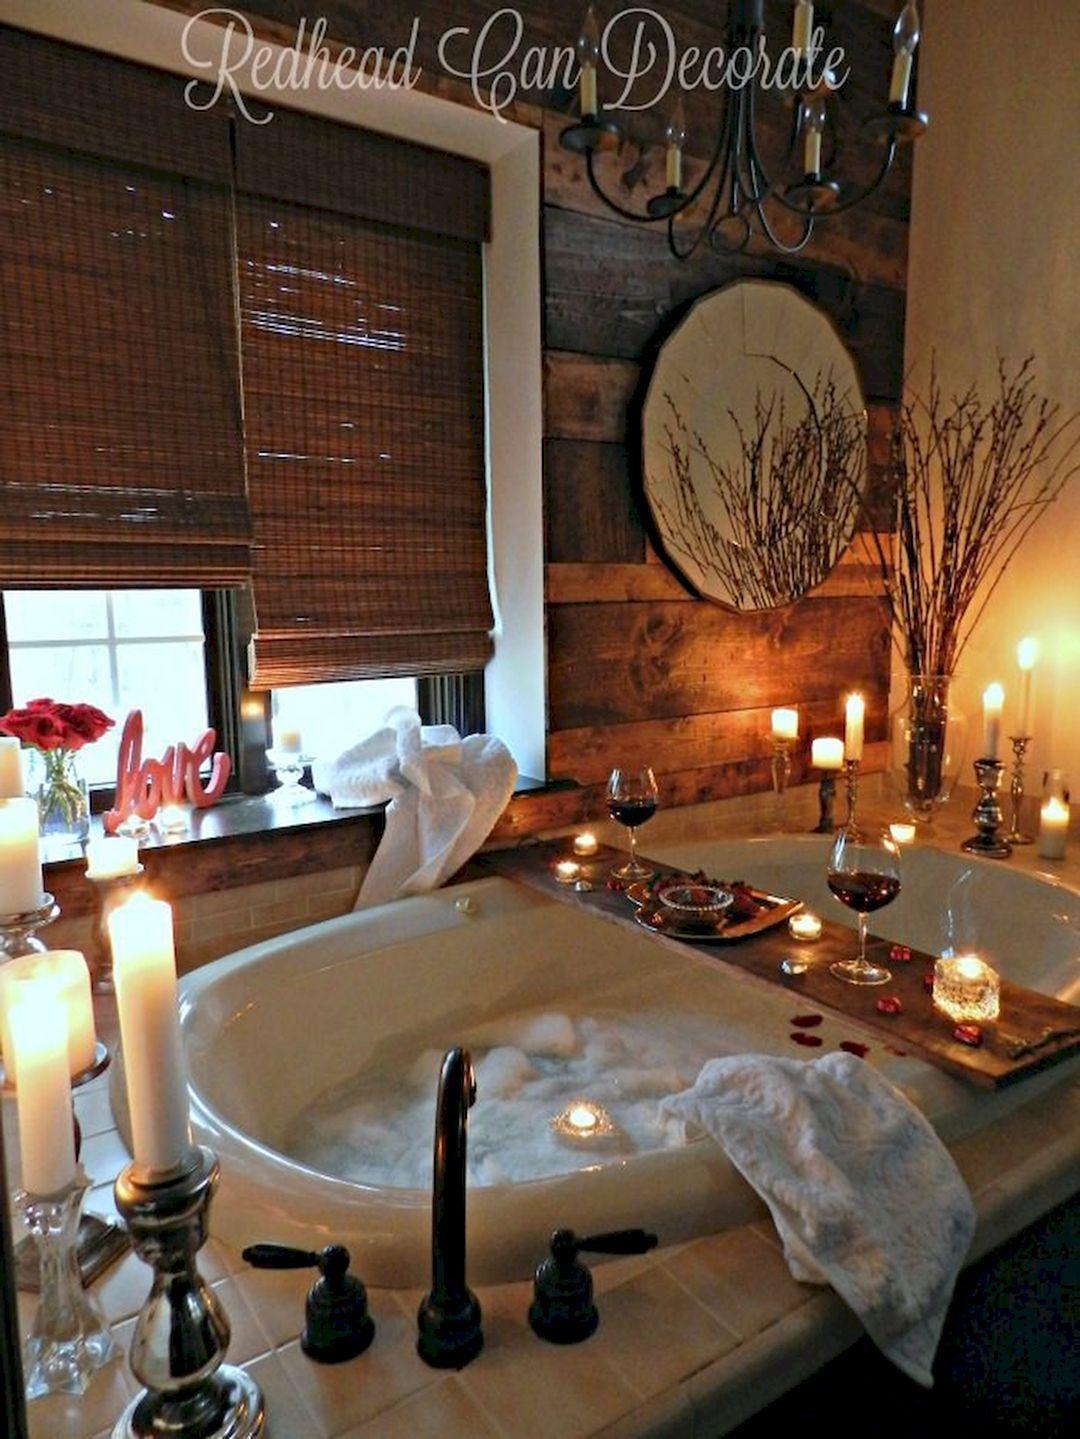 Modern Romantic Bedroom Designs: Wonderful Romantic Bedroom Design Ideas 160